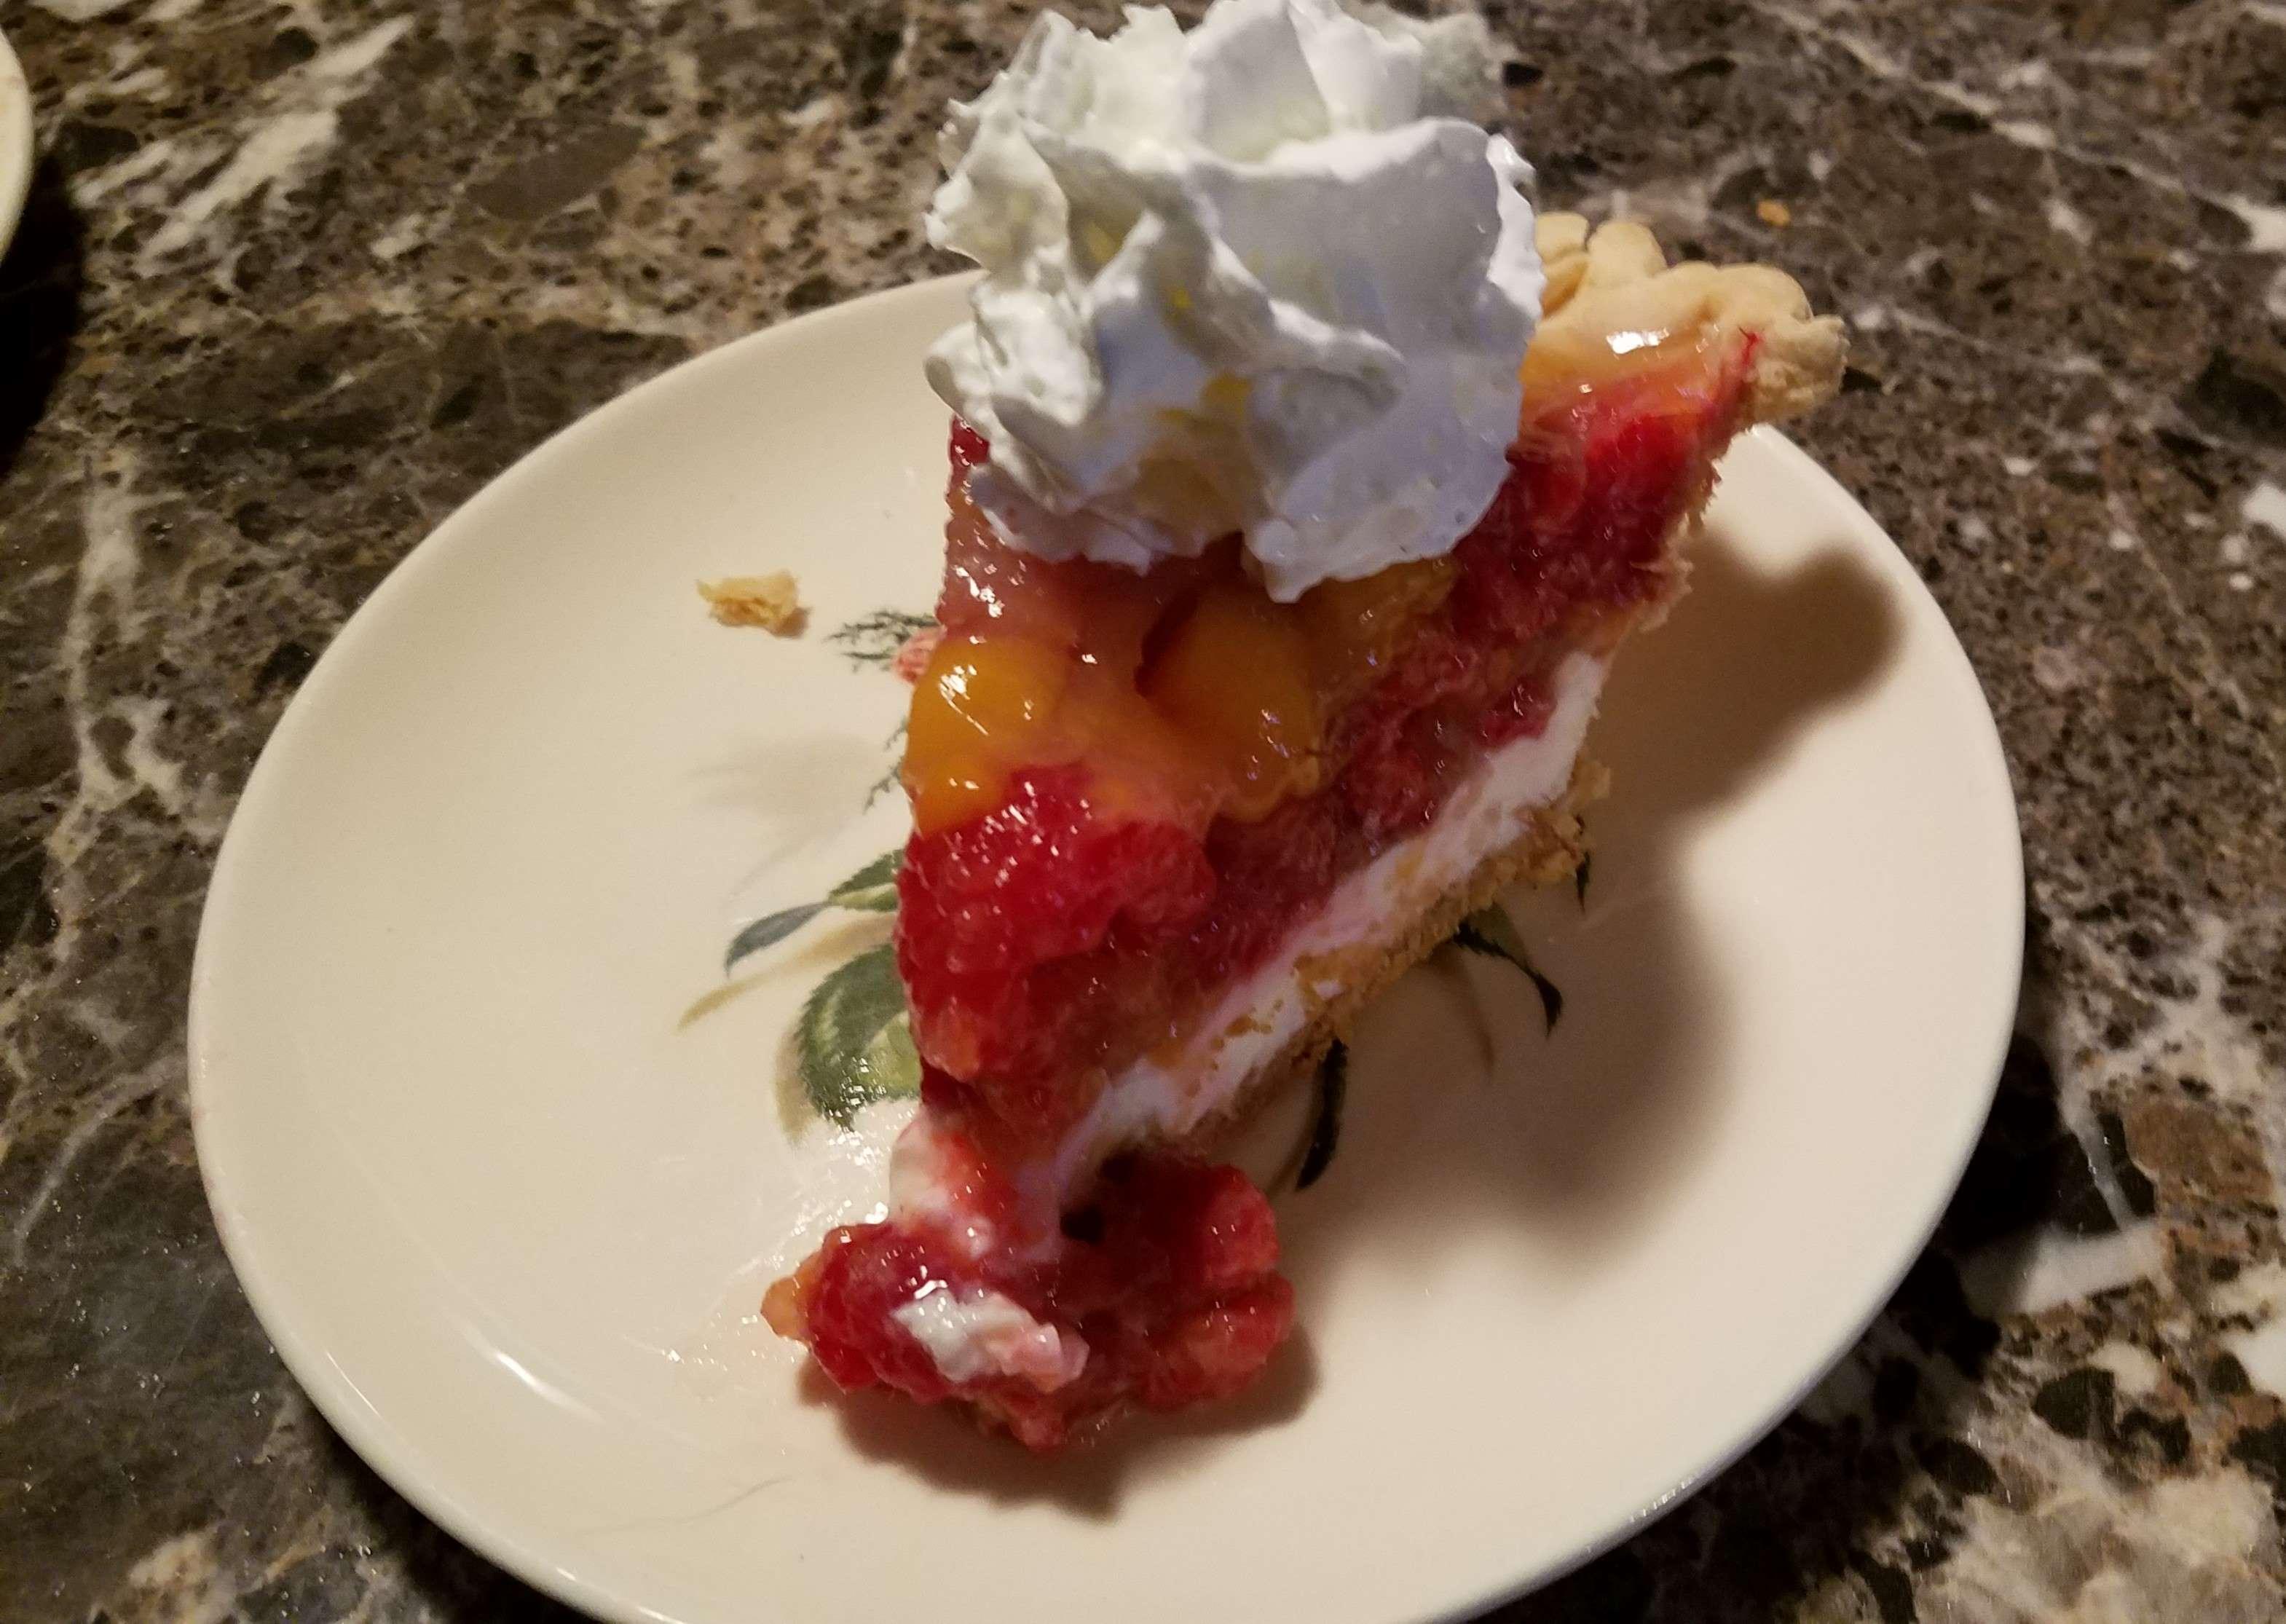 Peach-Glazed Raspberry and Cream Cheese Pie